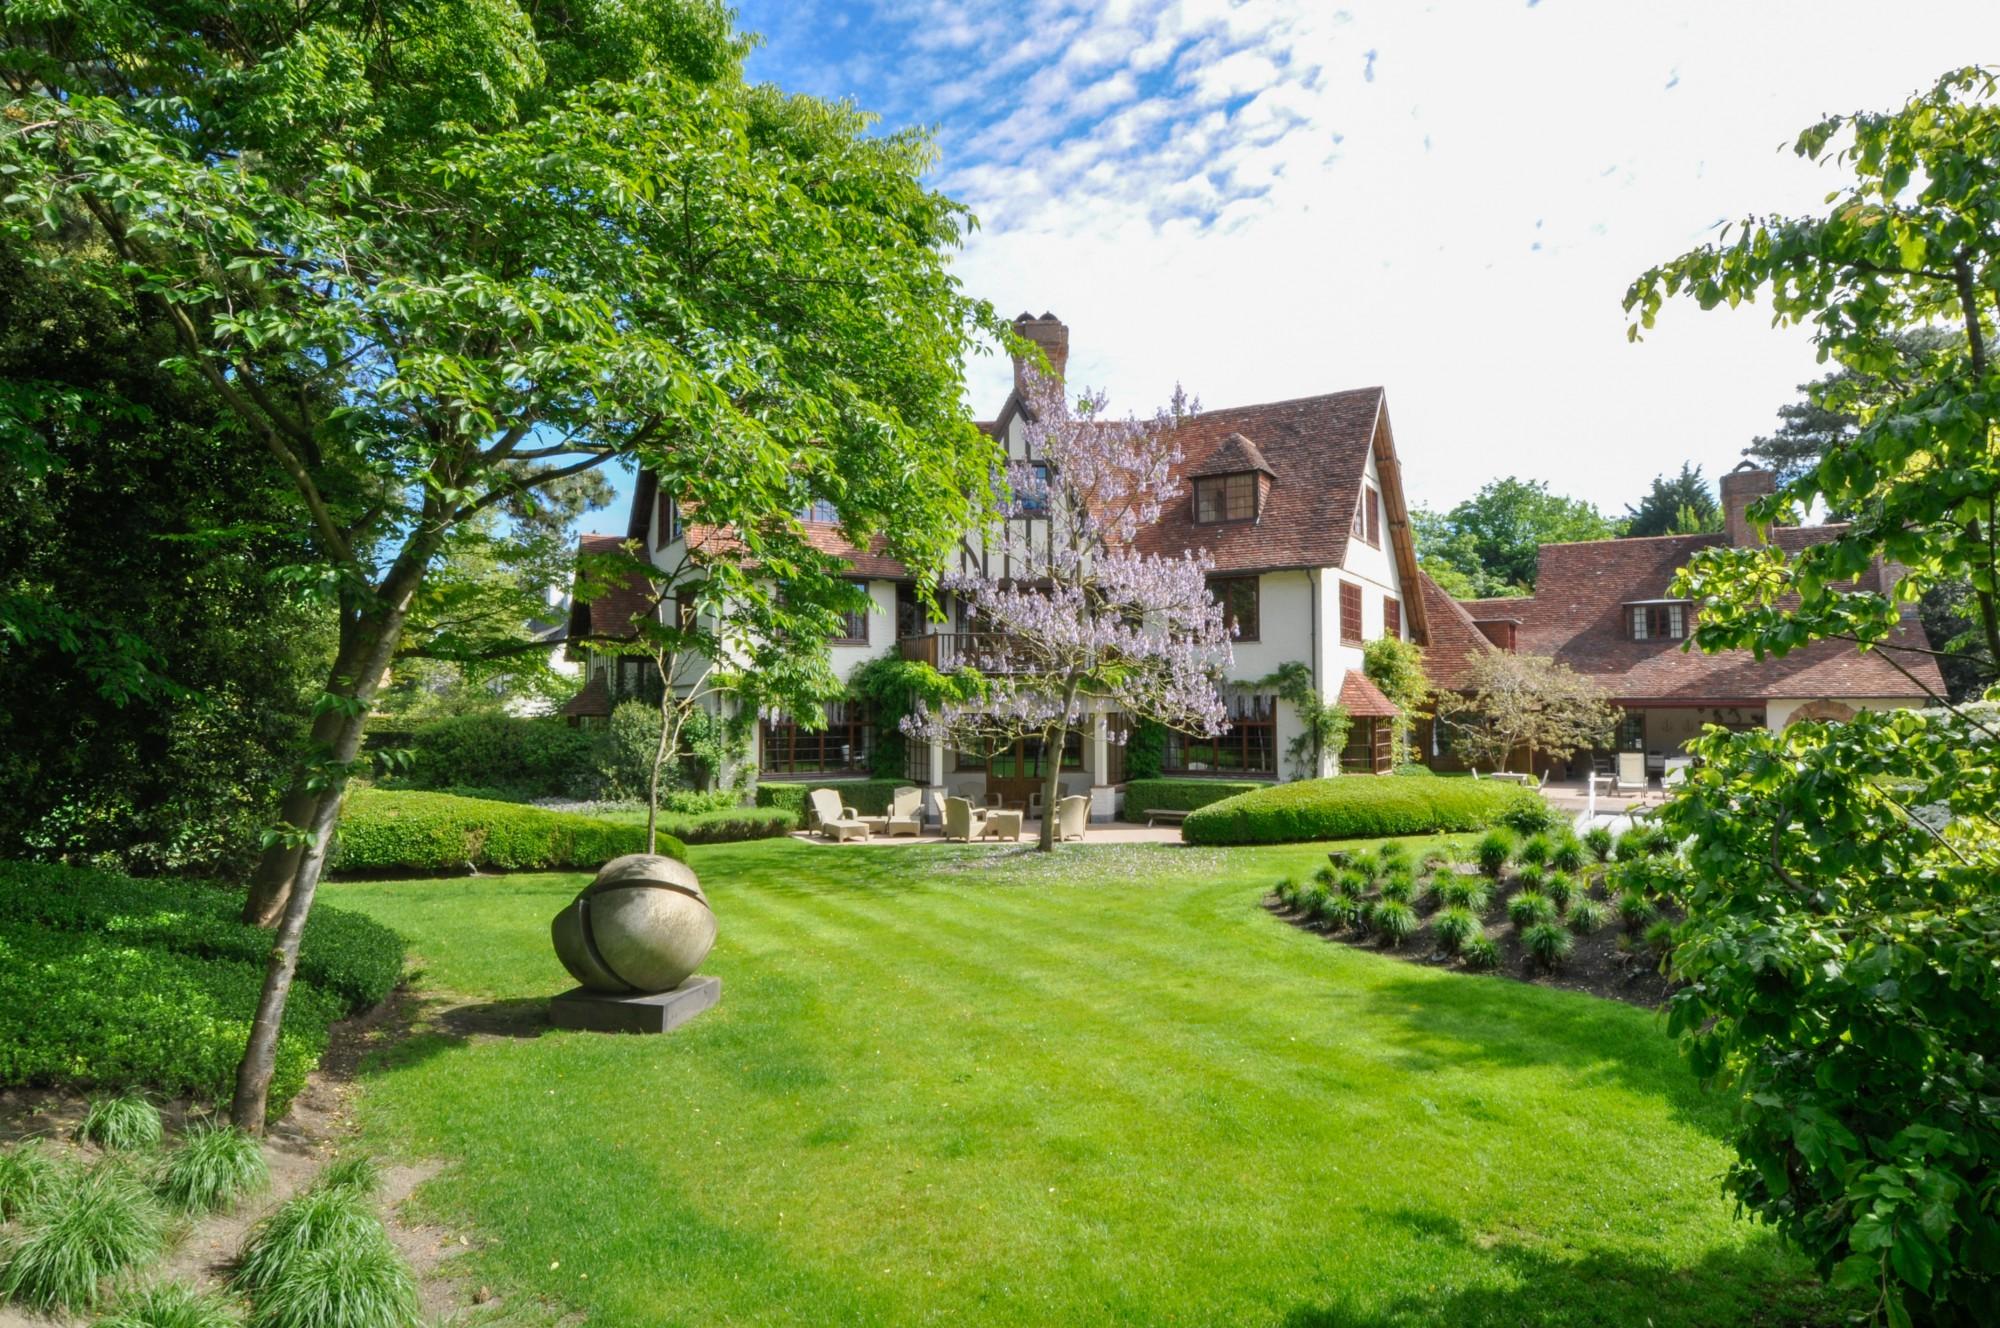 Location Villa 7 CH Knokke-Zoute - Royal Zoute Golf Club